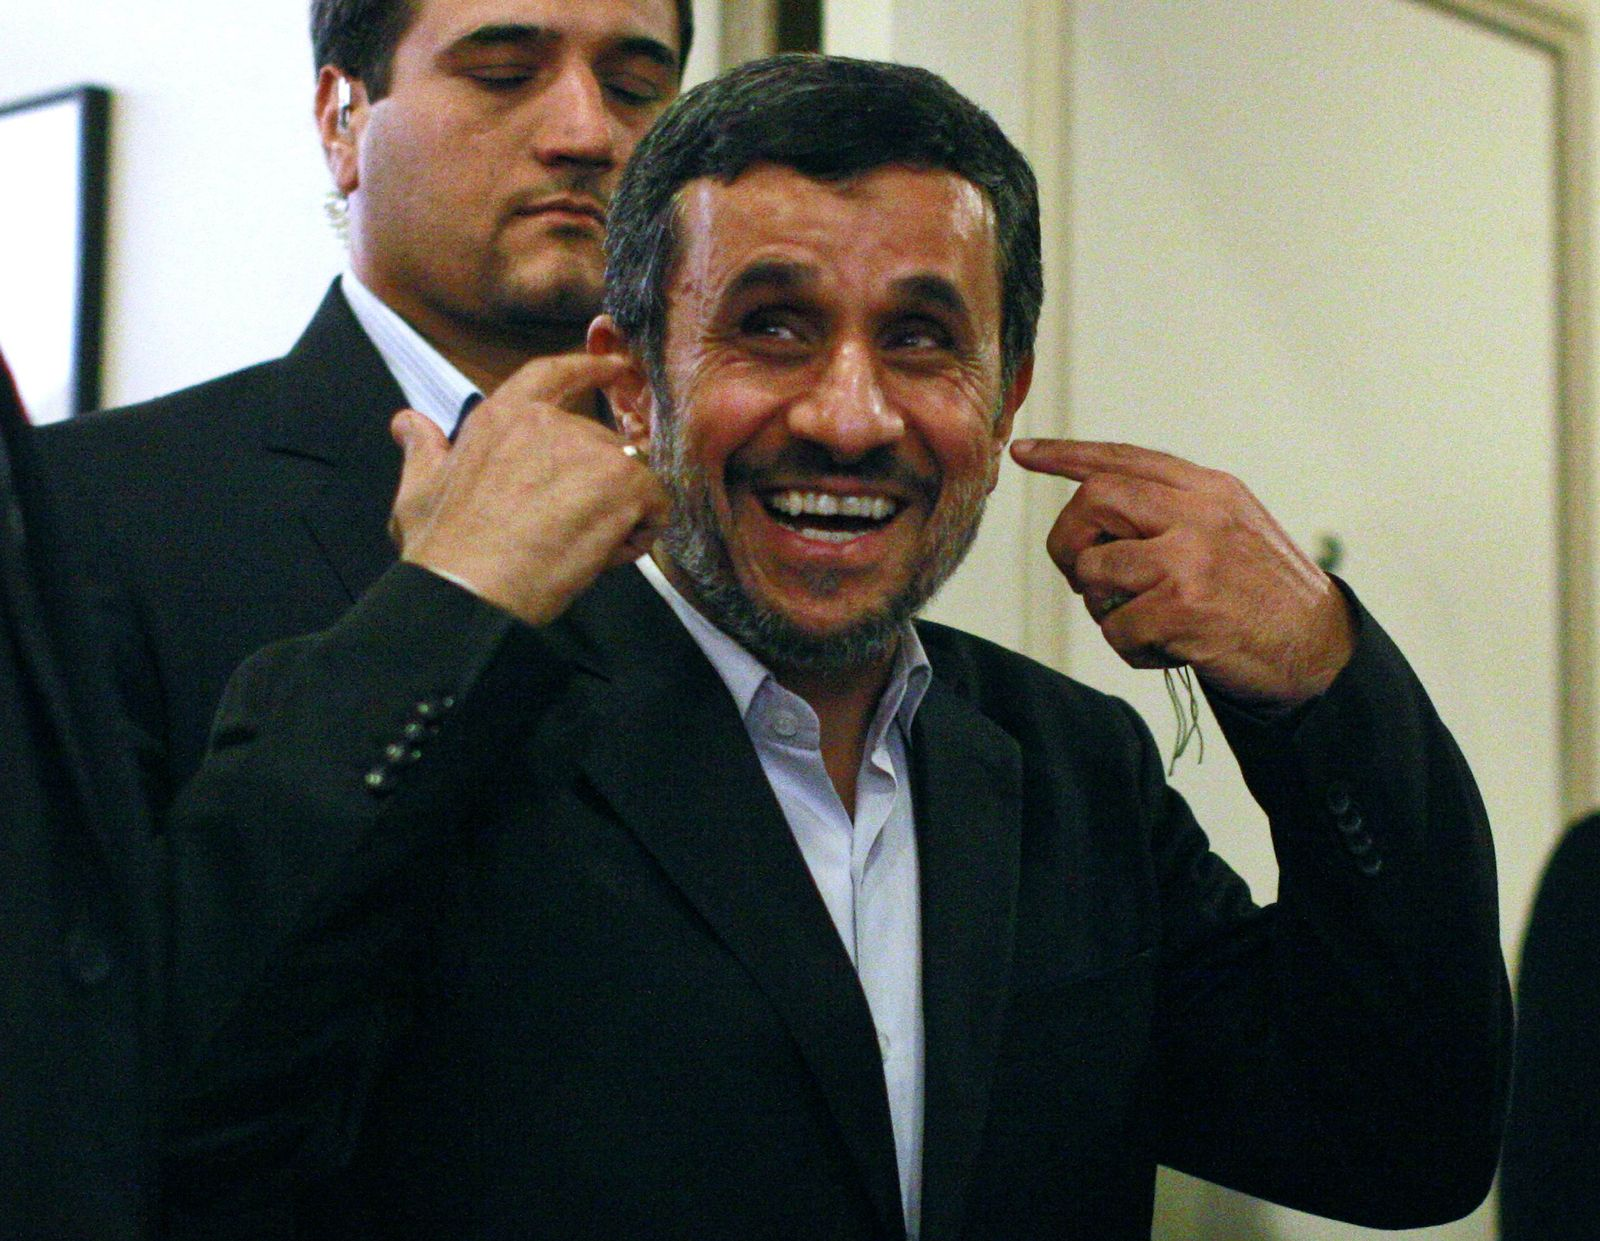 Iran/Ahmadinedschad